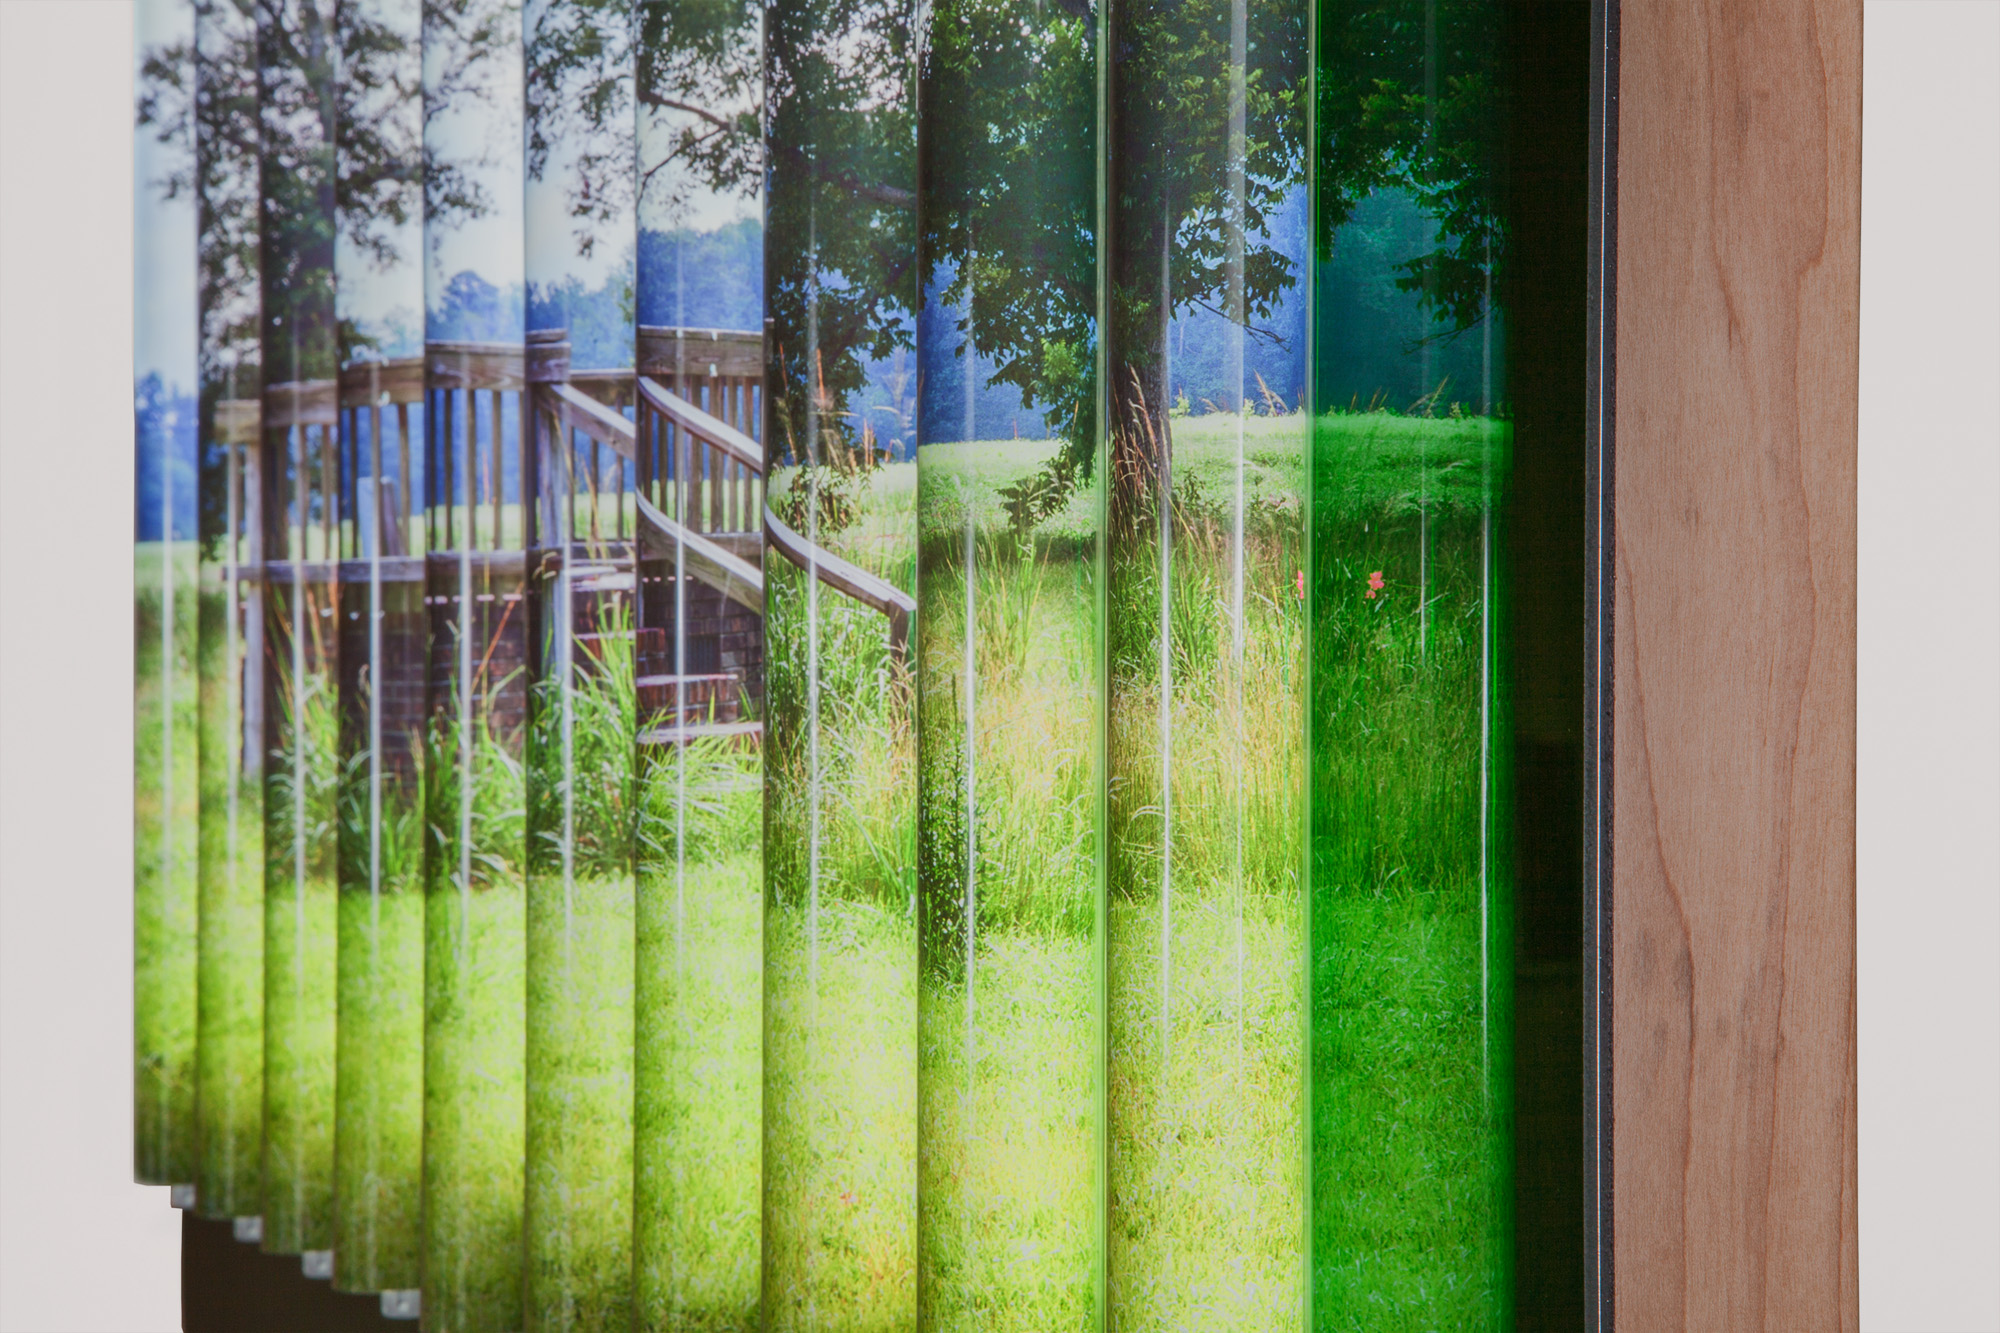 Baclawski_FWMoA-Greener-Pastures-4.jpg